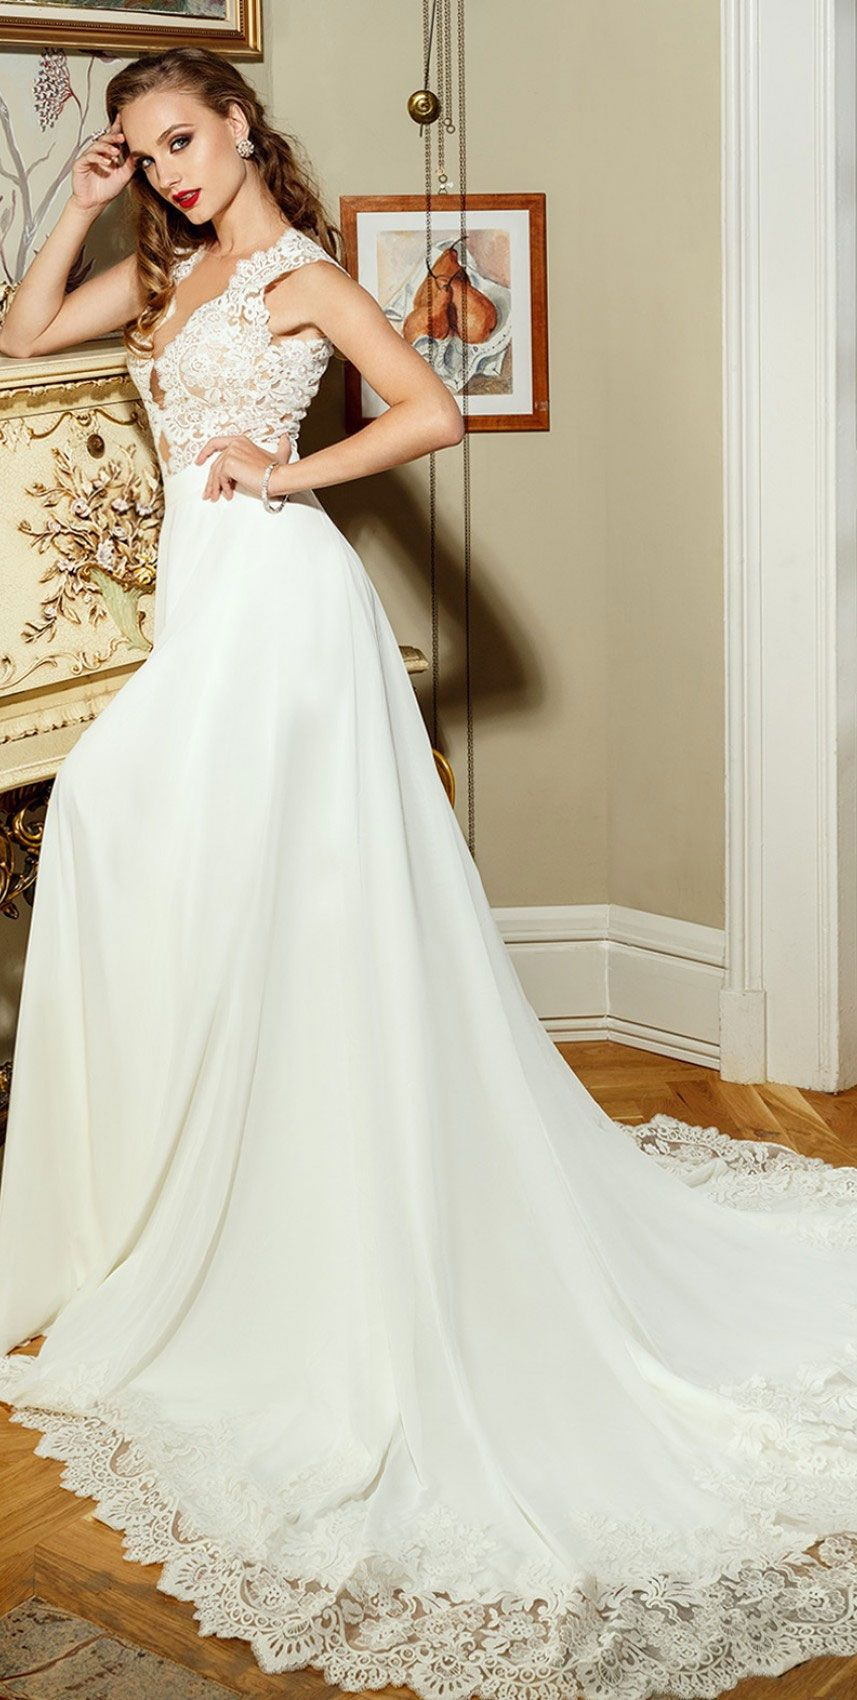 Wedding Dresses with Inspiring Glamour